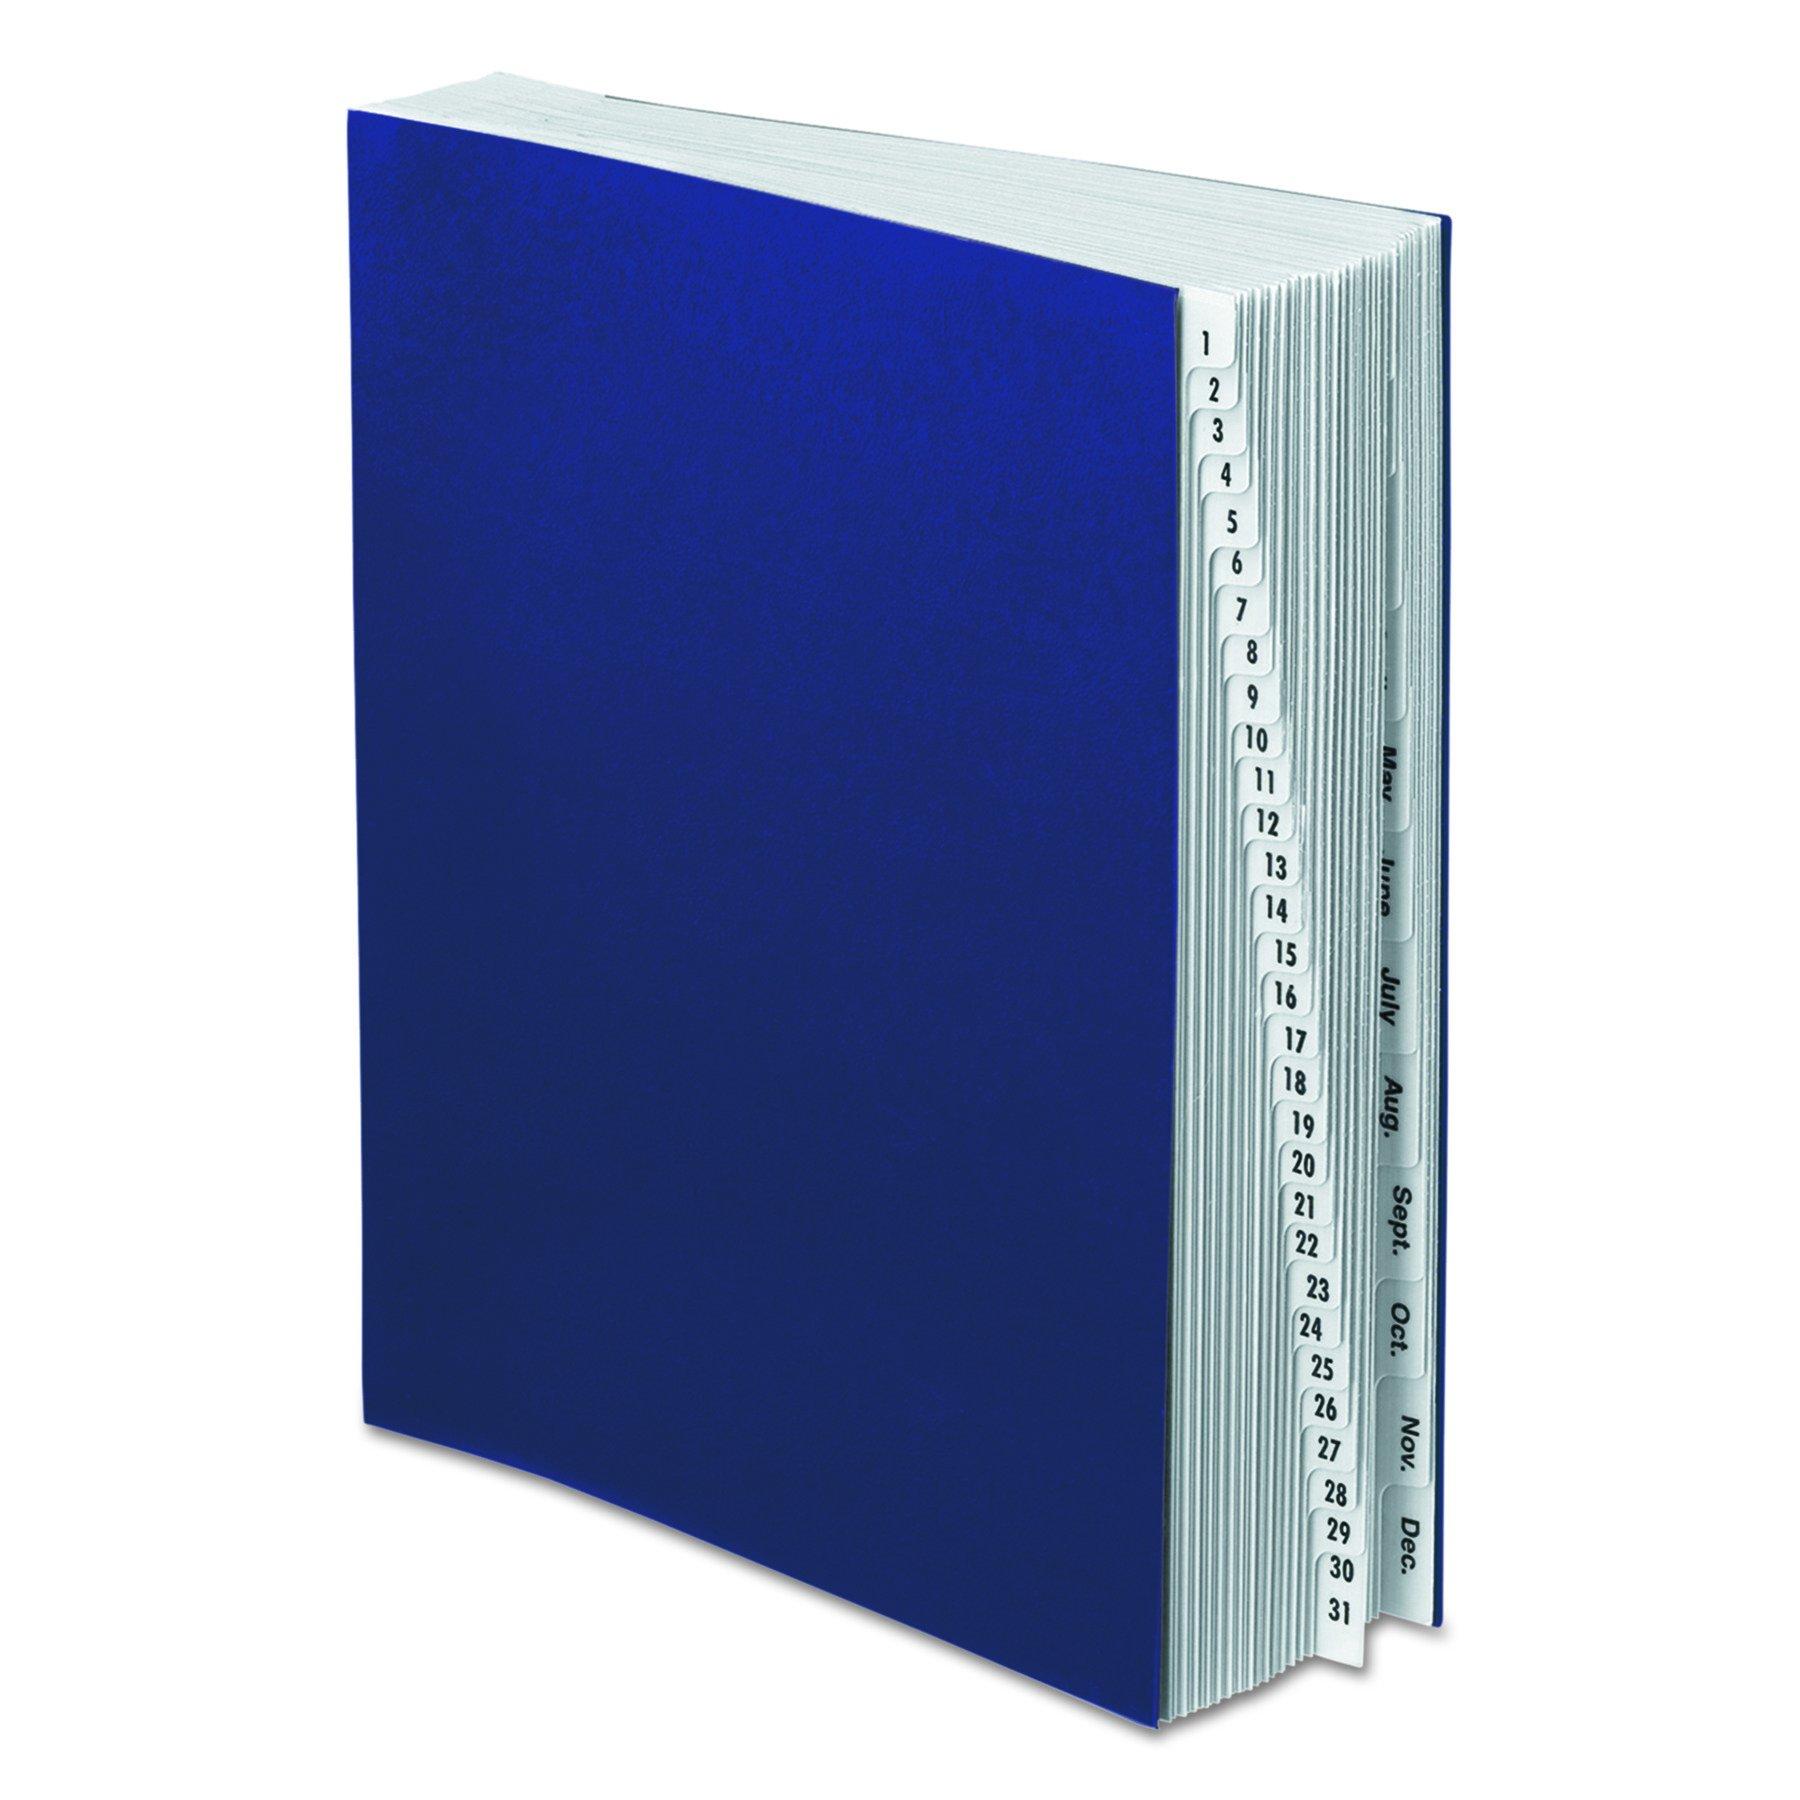 Pendaflex DDF5OX Expanding Desk File, 1-31/Jan-Dec, Letter, Acrylic-Coated Pressboard, Dark Blue by Pendaflex